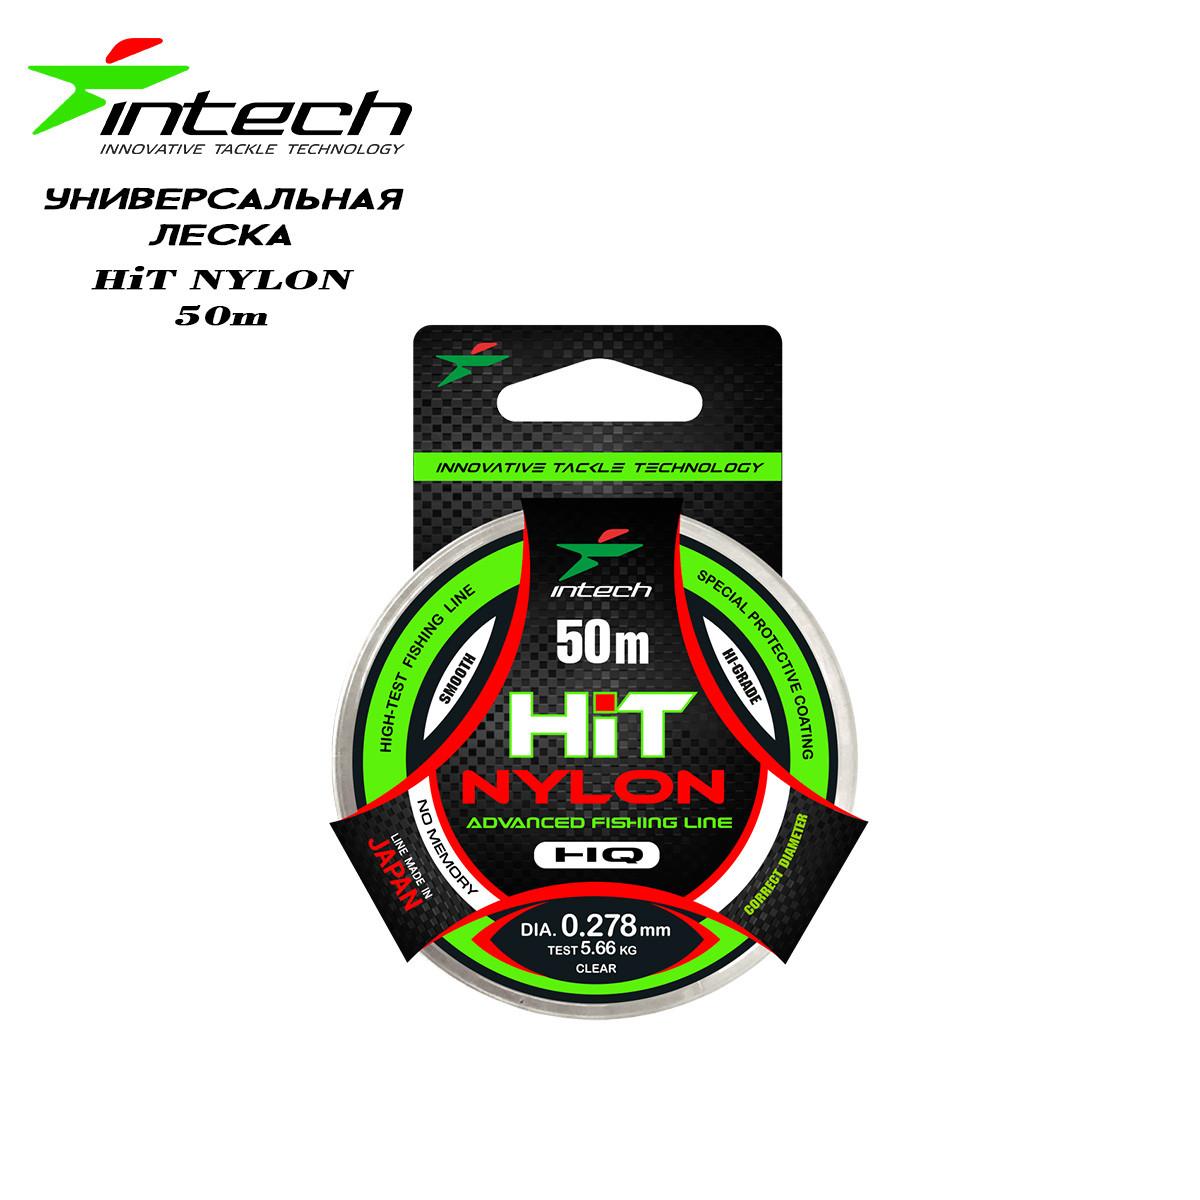 Леска Intech HIT 50m (0.312mm, 7.20kg)